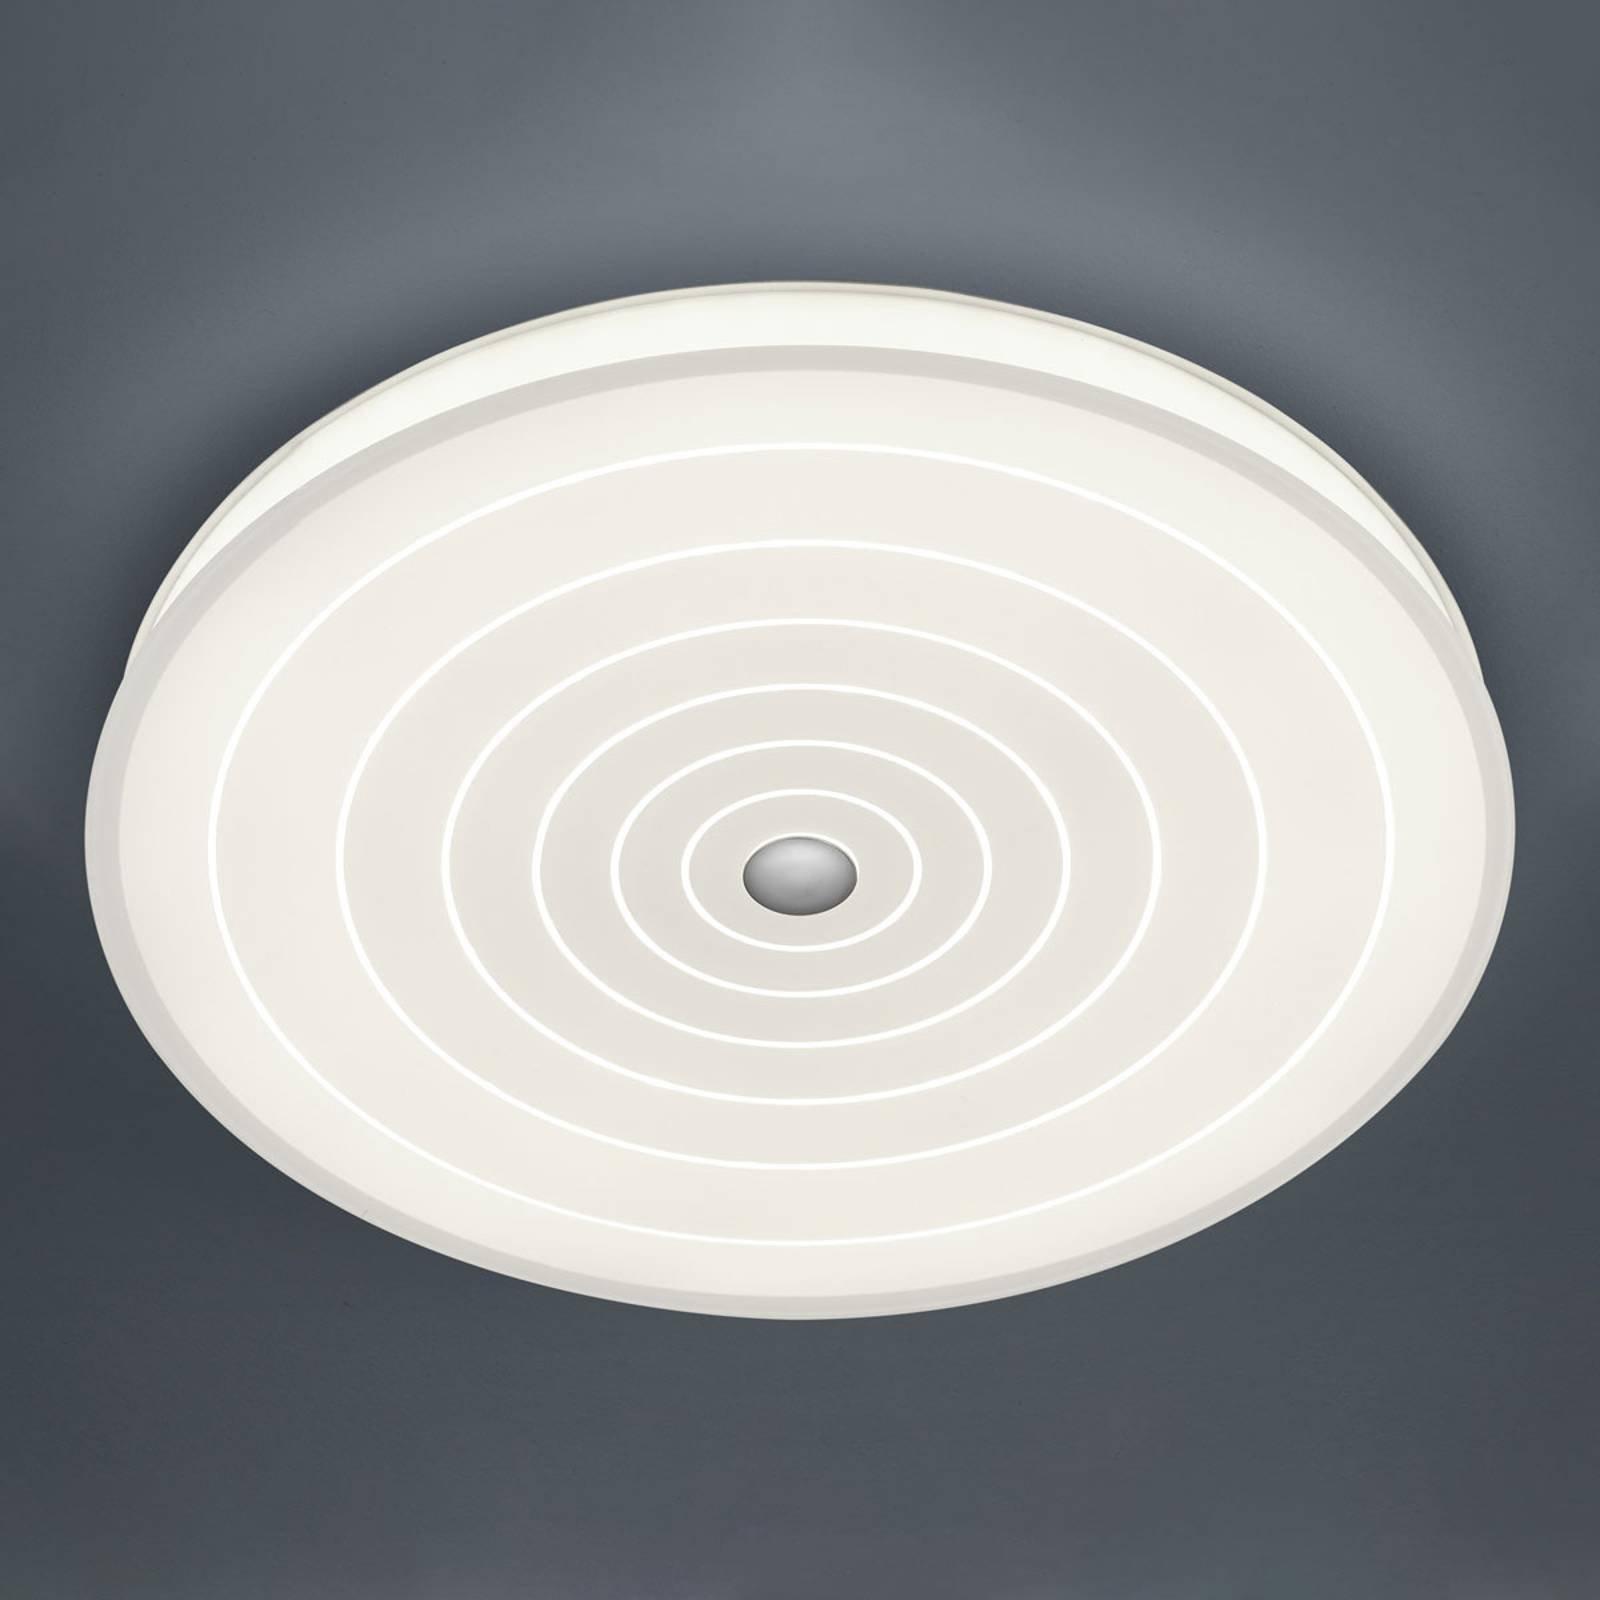 BANKAMP Mandala LED-taklampe sirkler, Ø 52 cm